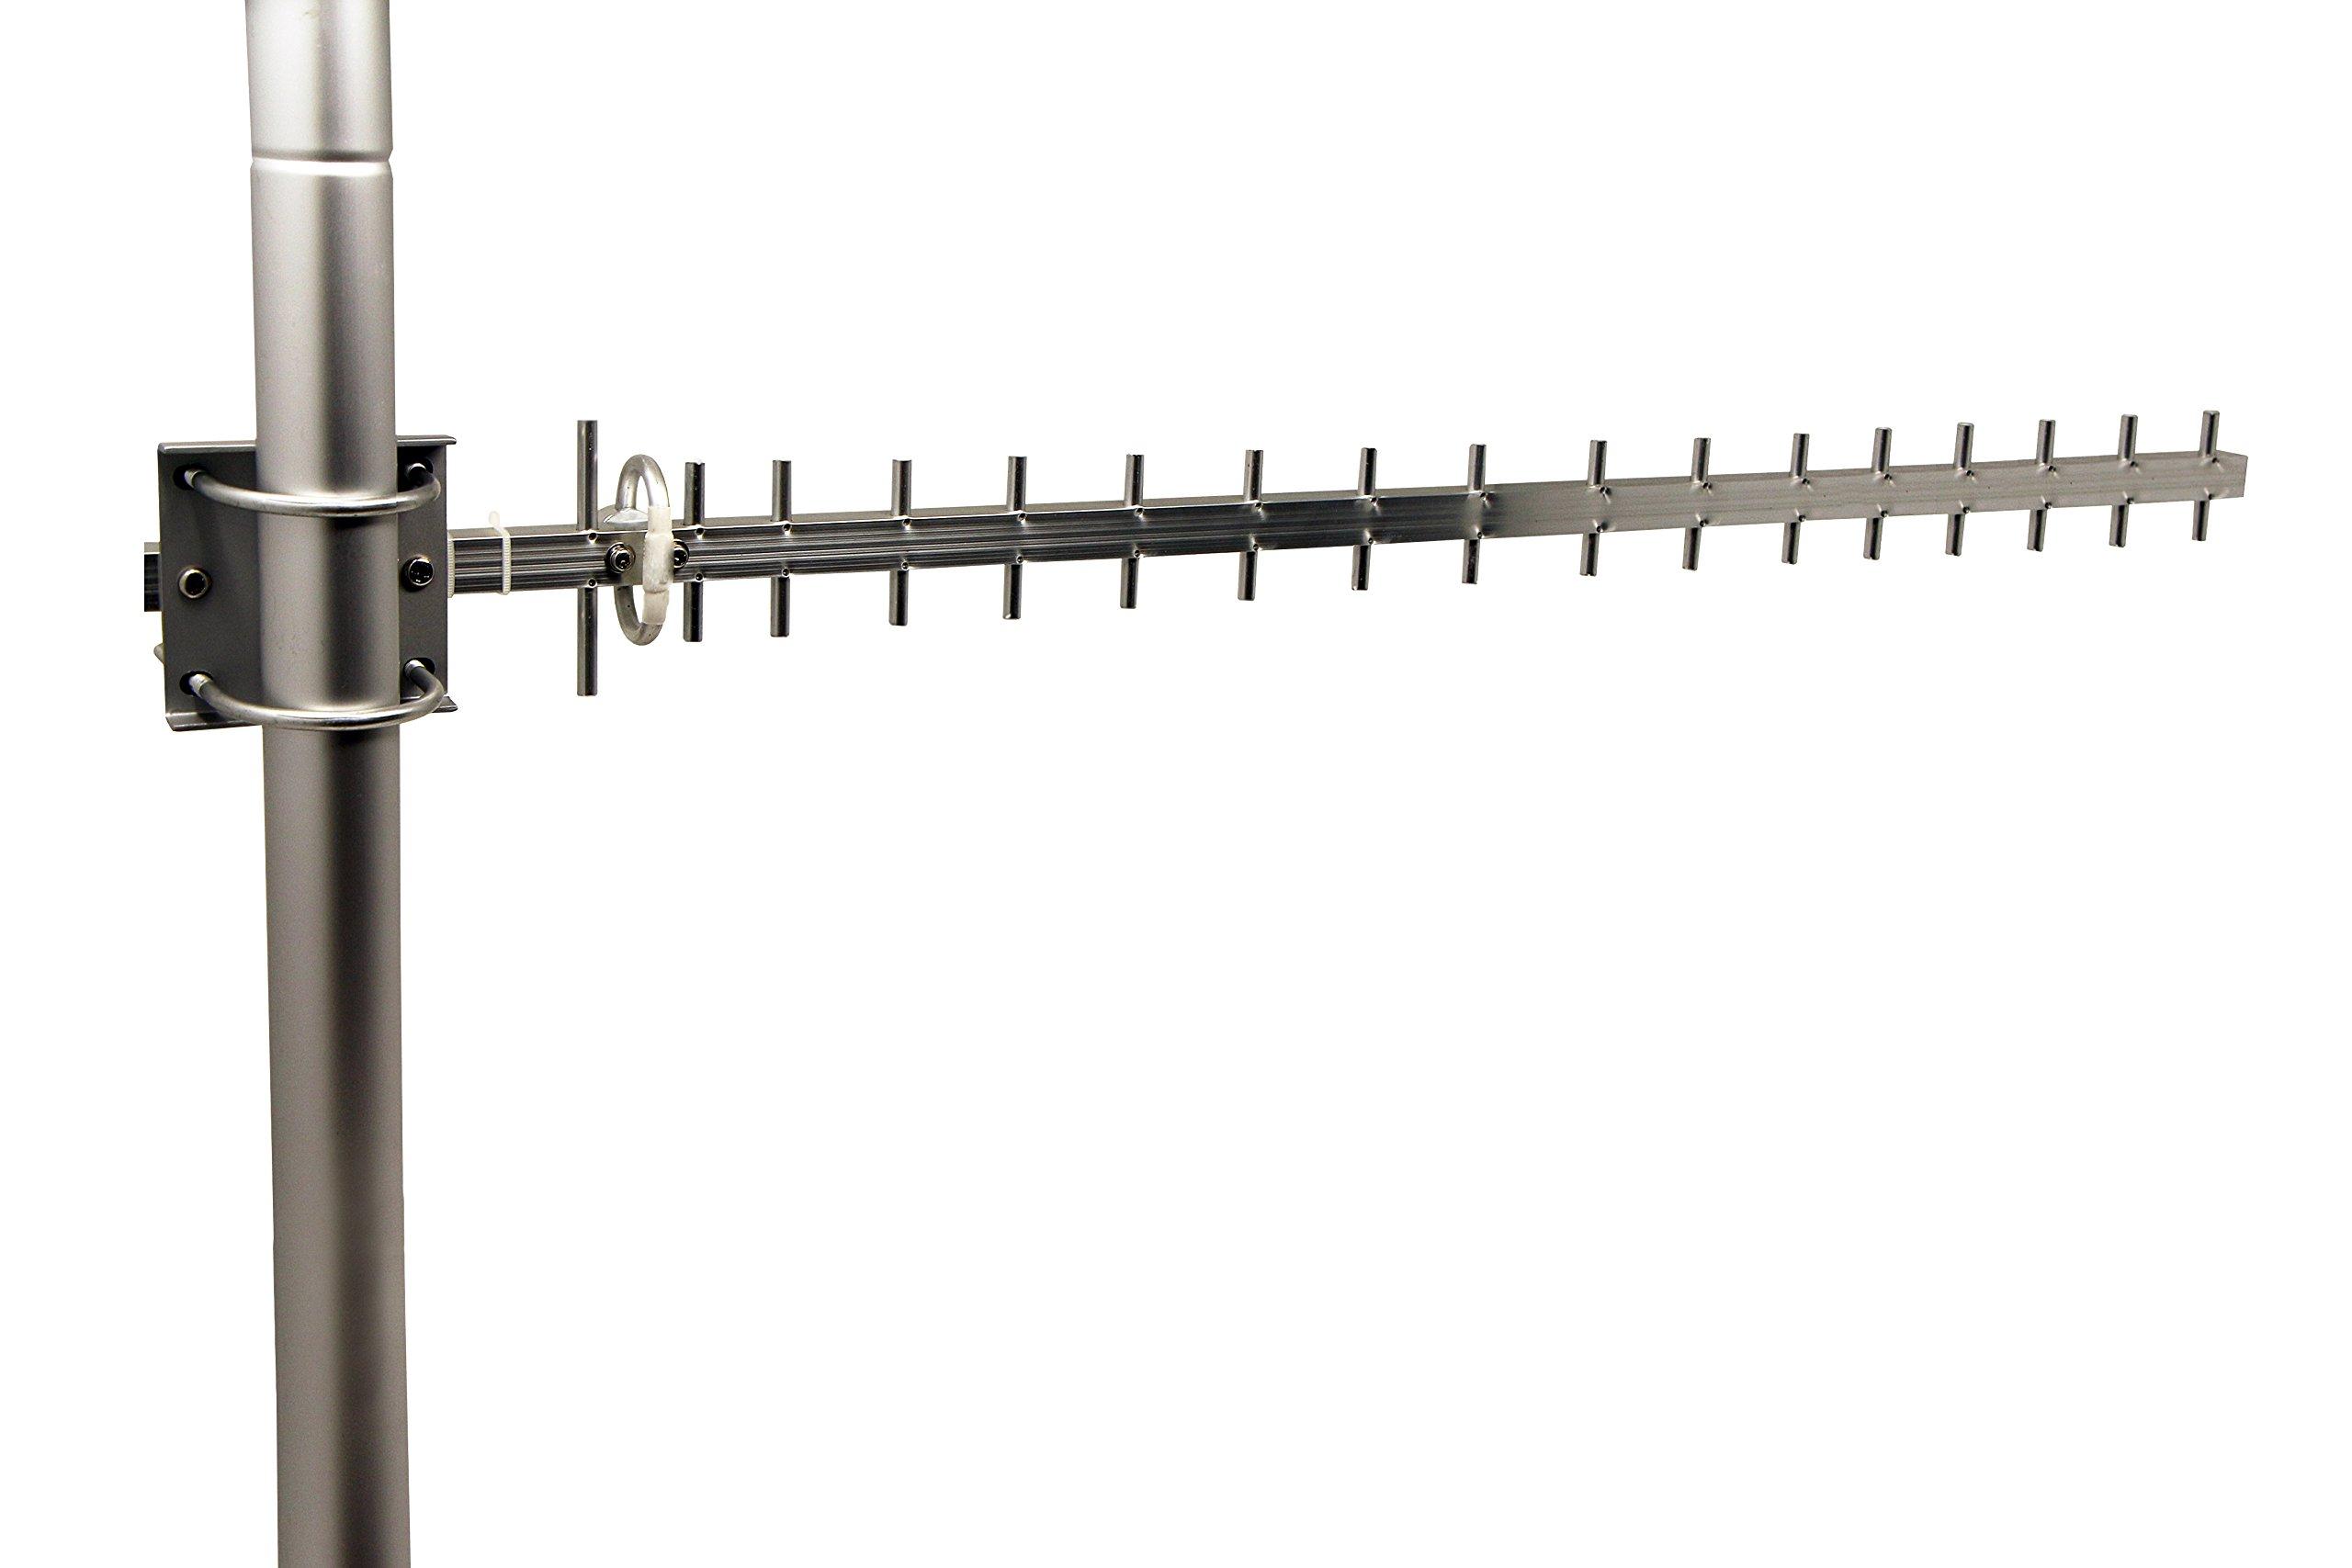 Tupavco TP513 Yagi WiFi Antenna 2.4GHz 17dBi Angle H:25° V:24 Outdoor Directional Wireless by Tupavco